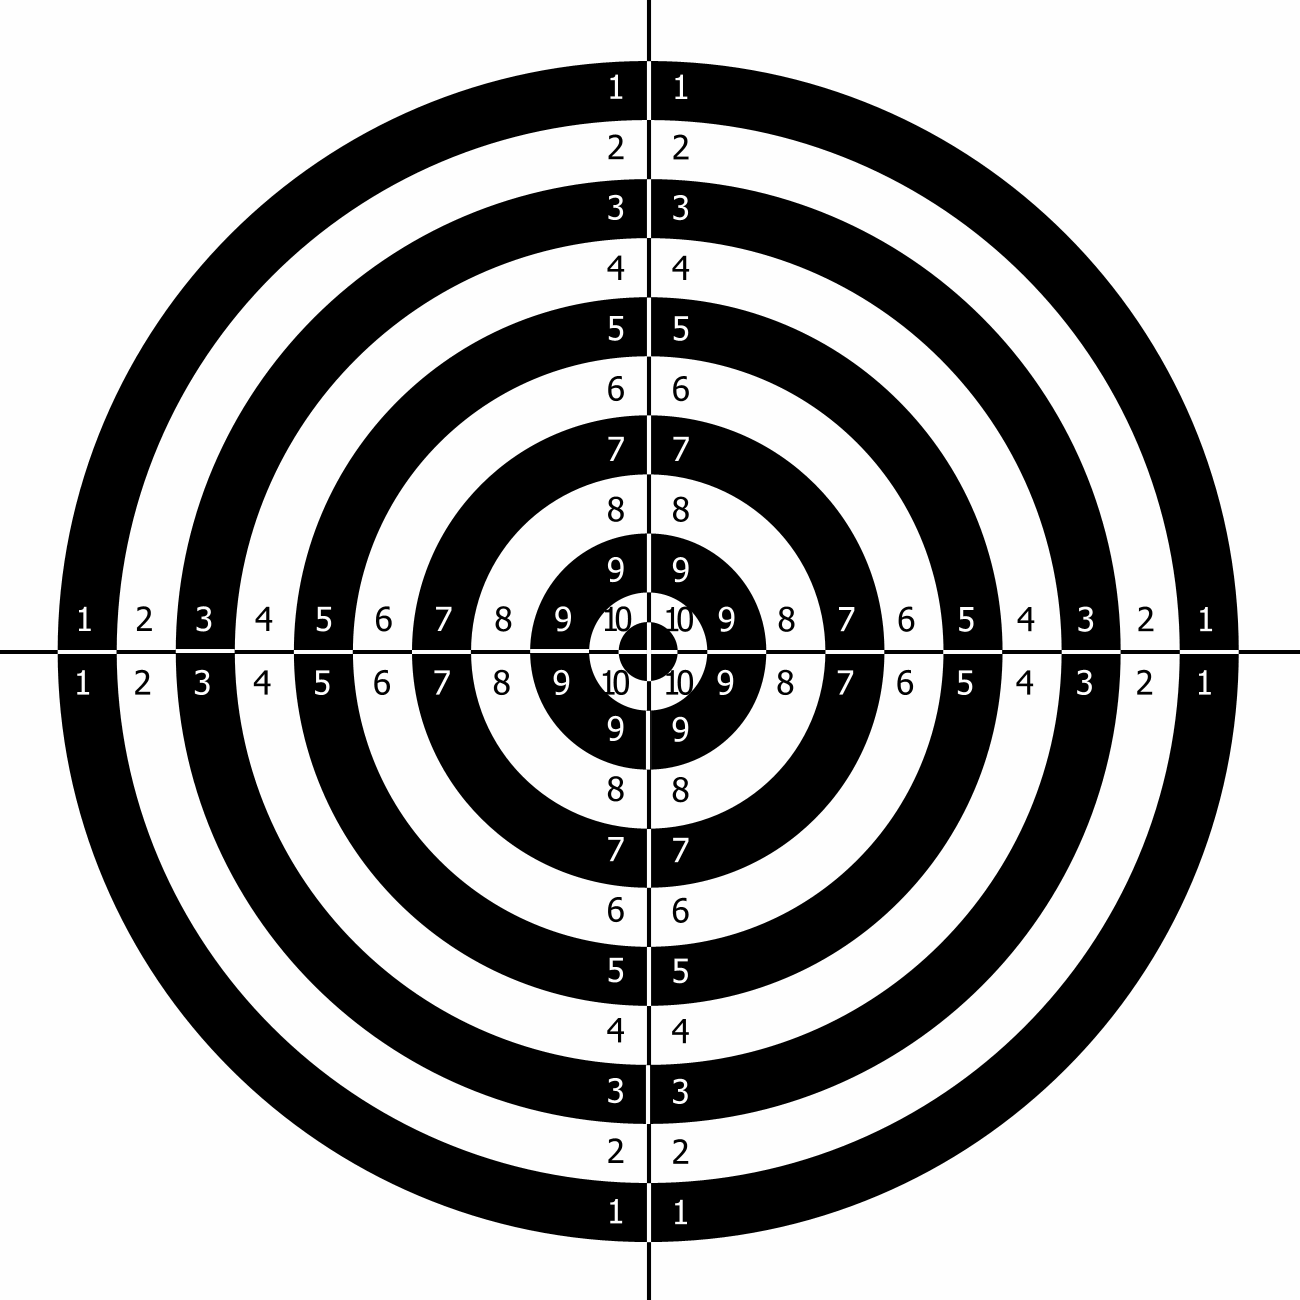 Shooting Targets Png 62k Shooting targets, Pistol